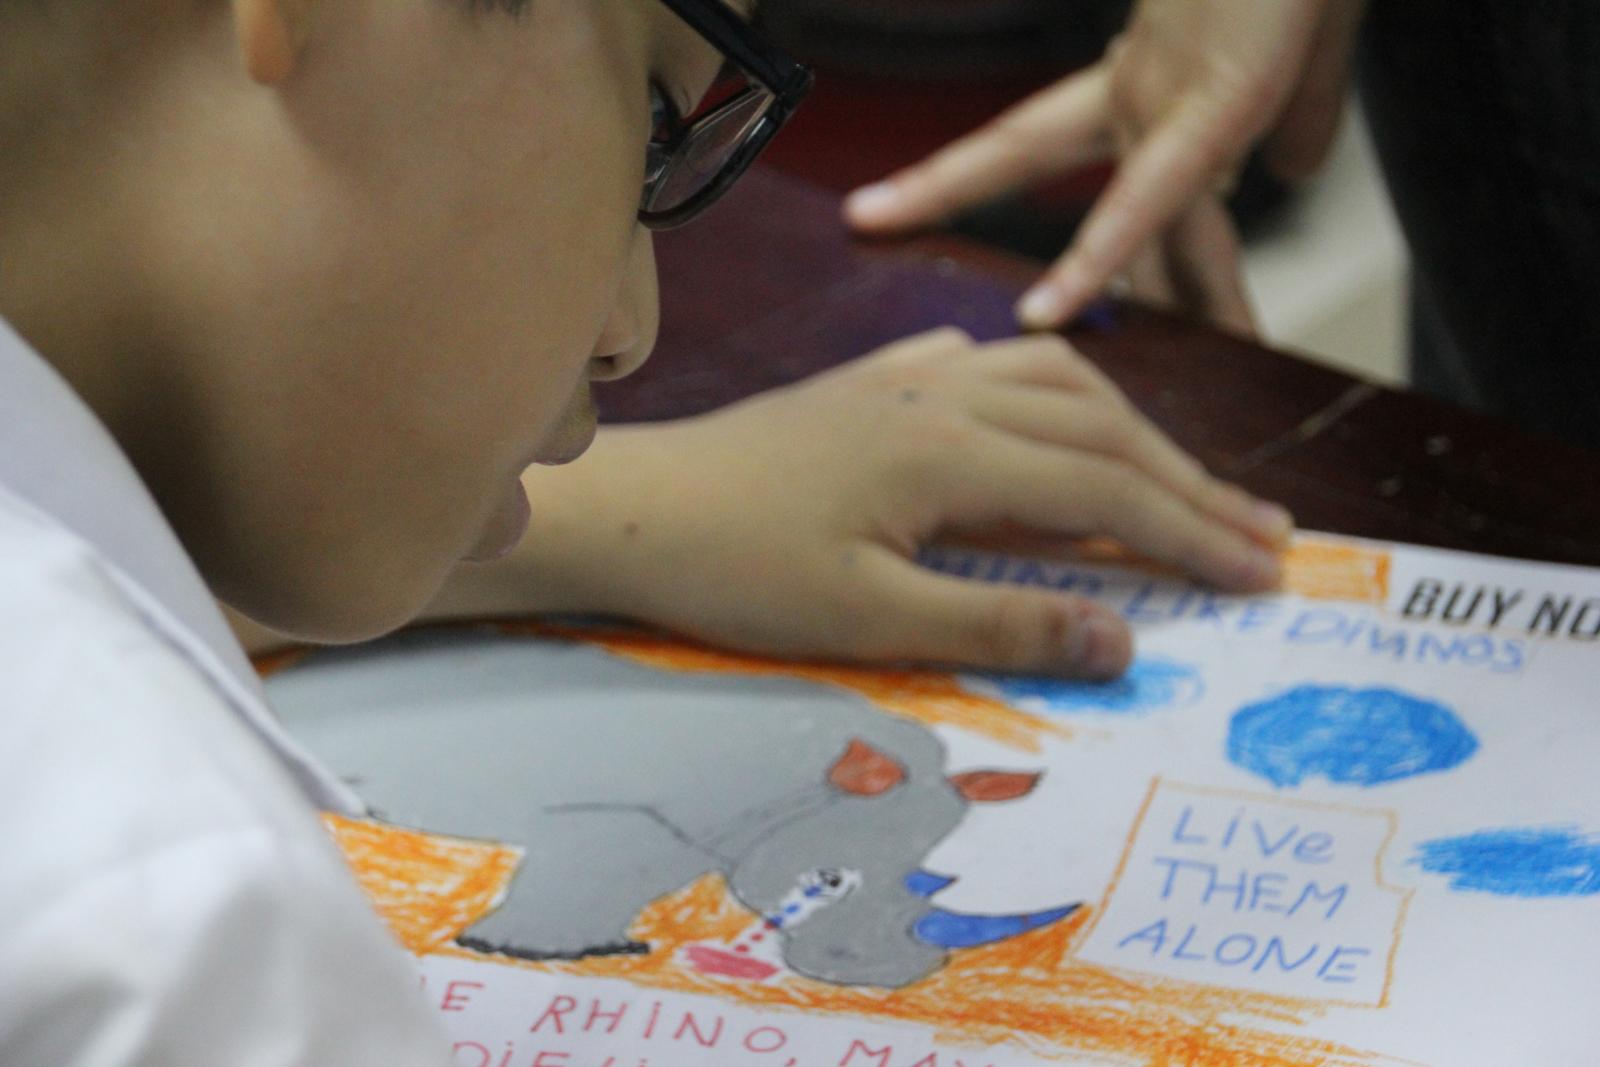 kids-often-drew-rhinos-with-tears-buy-no-rhino